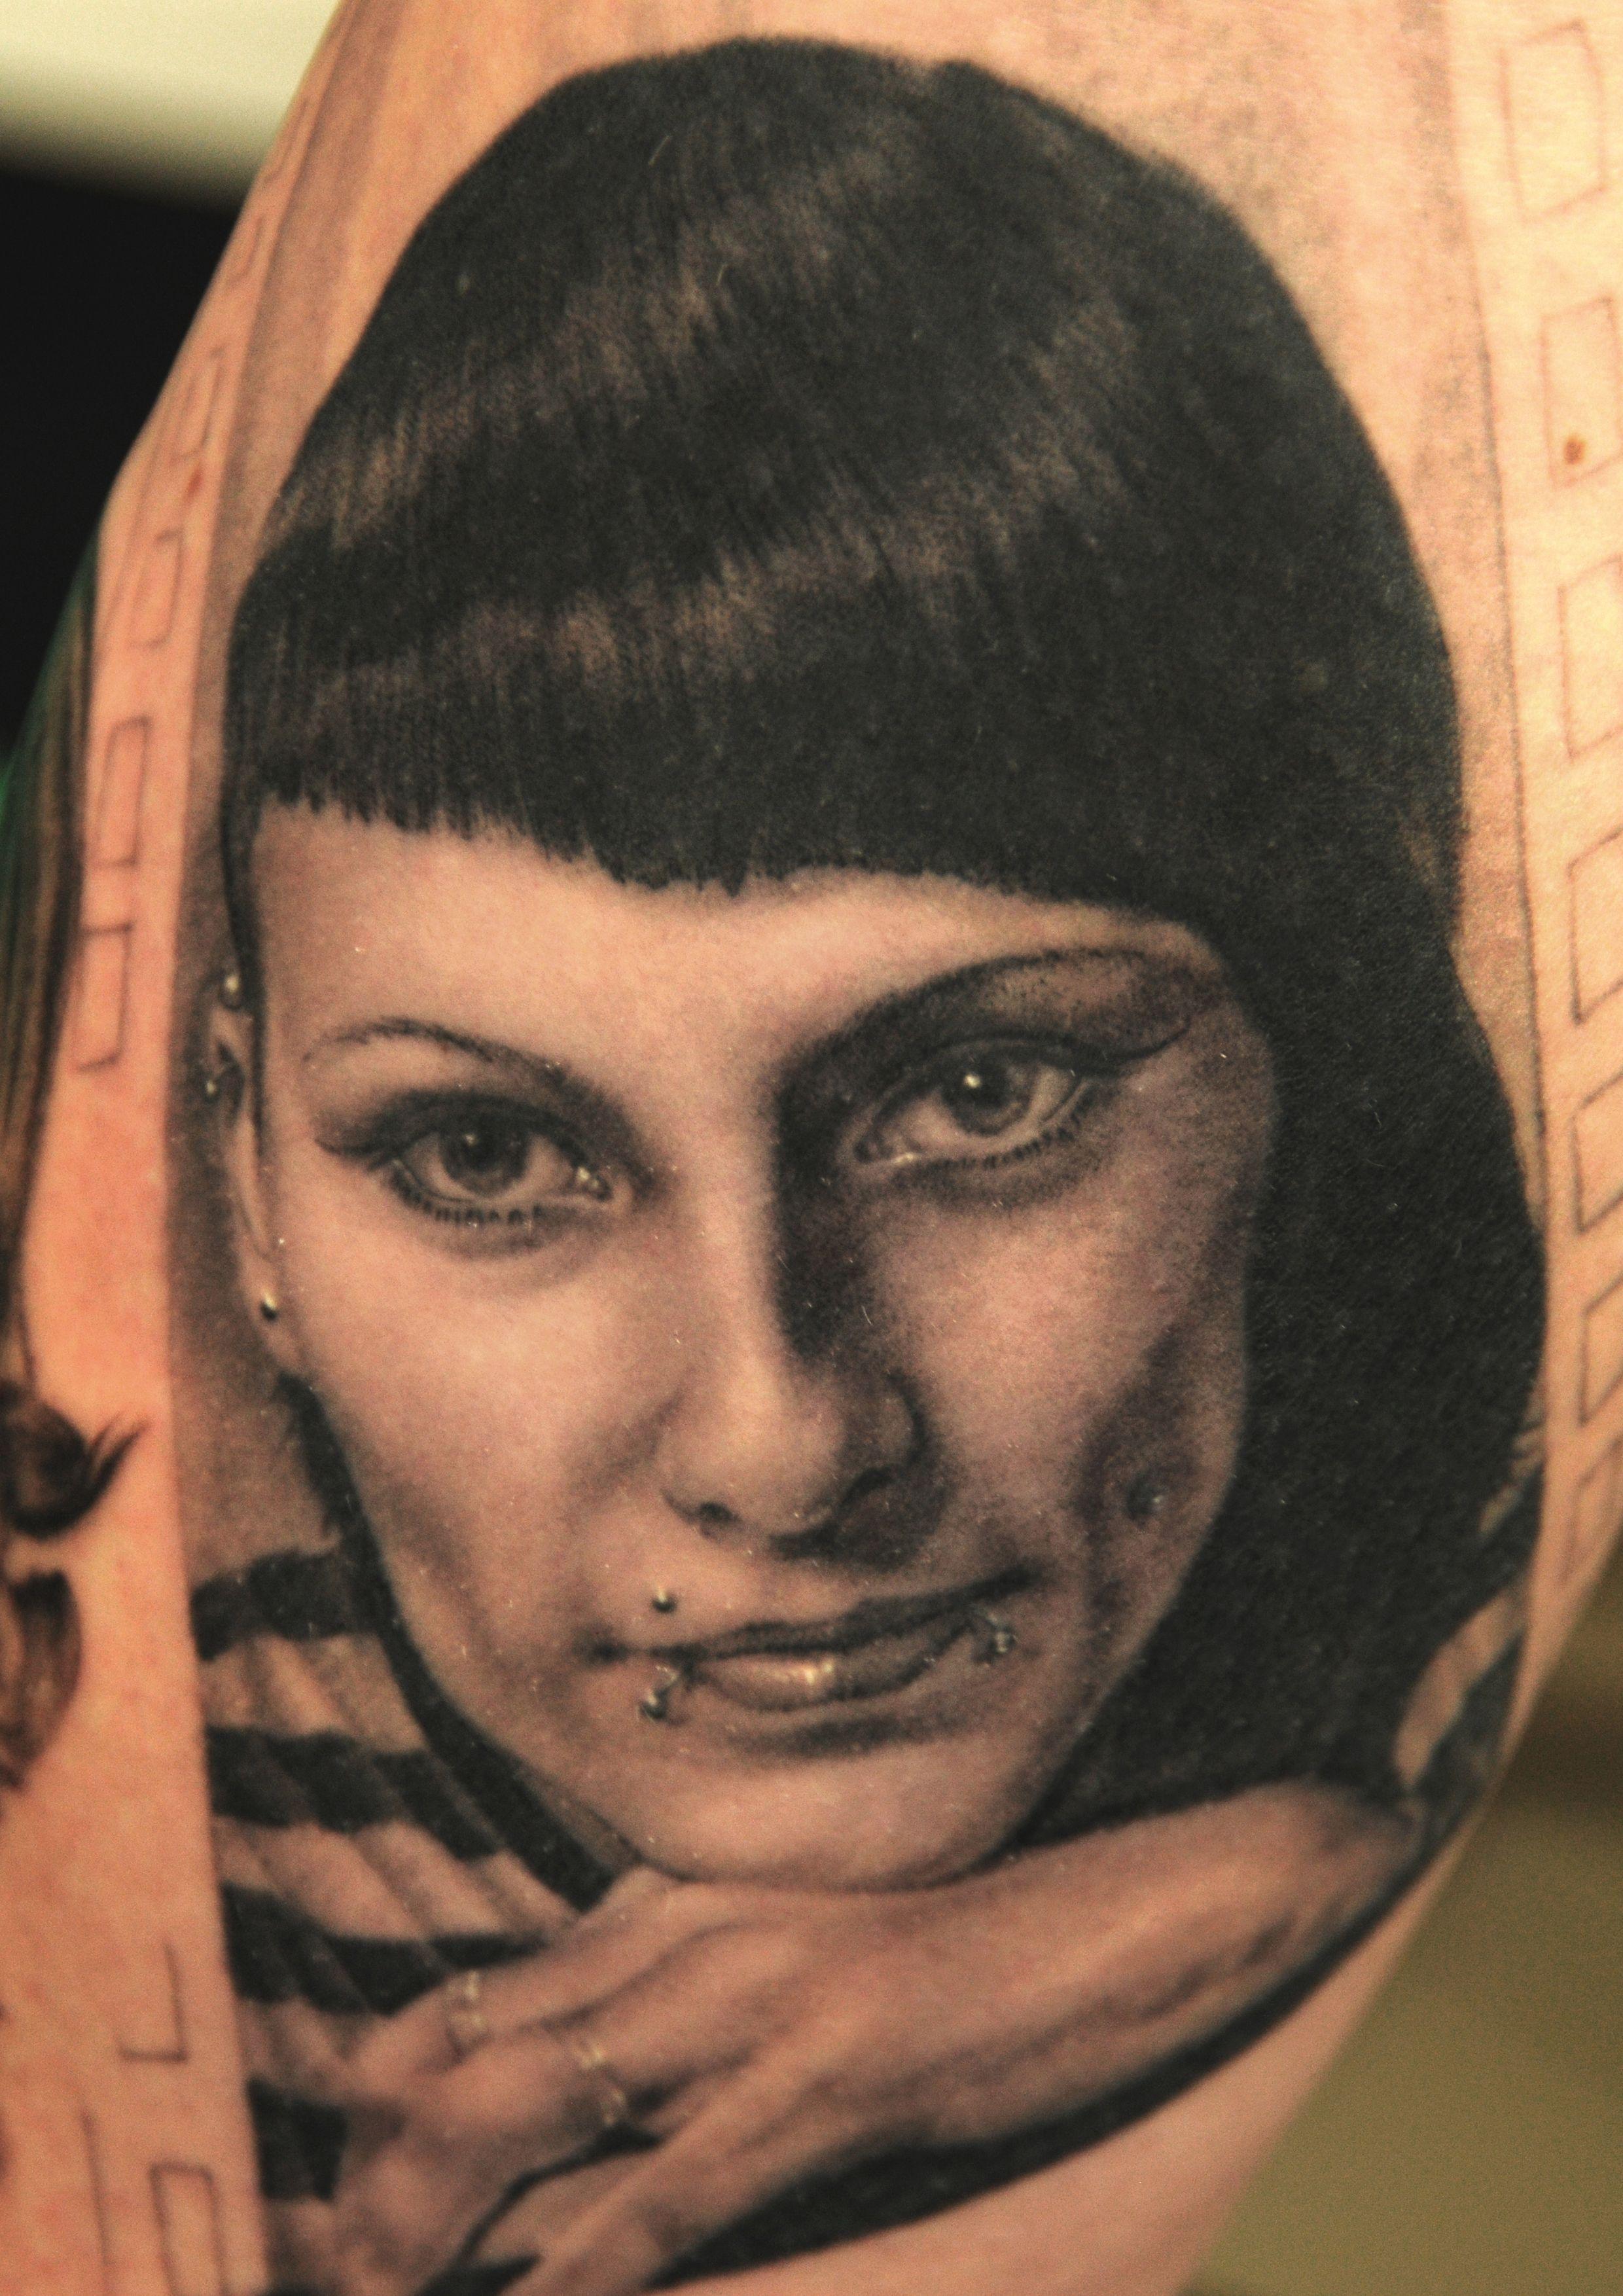 Tattoo Artist Andy Engel Portraits/Tattoos I did of